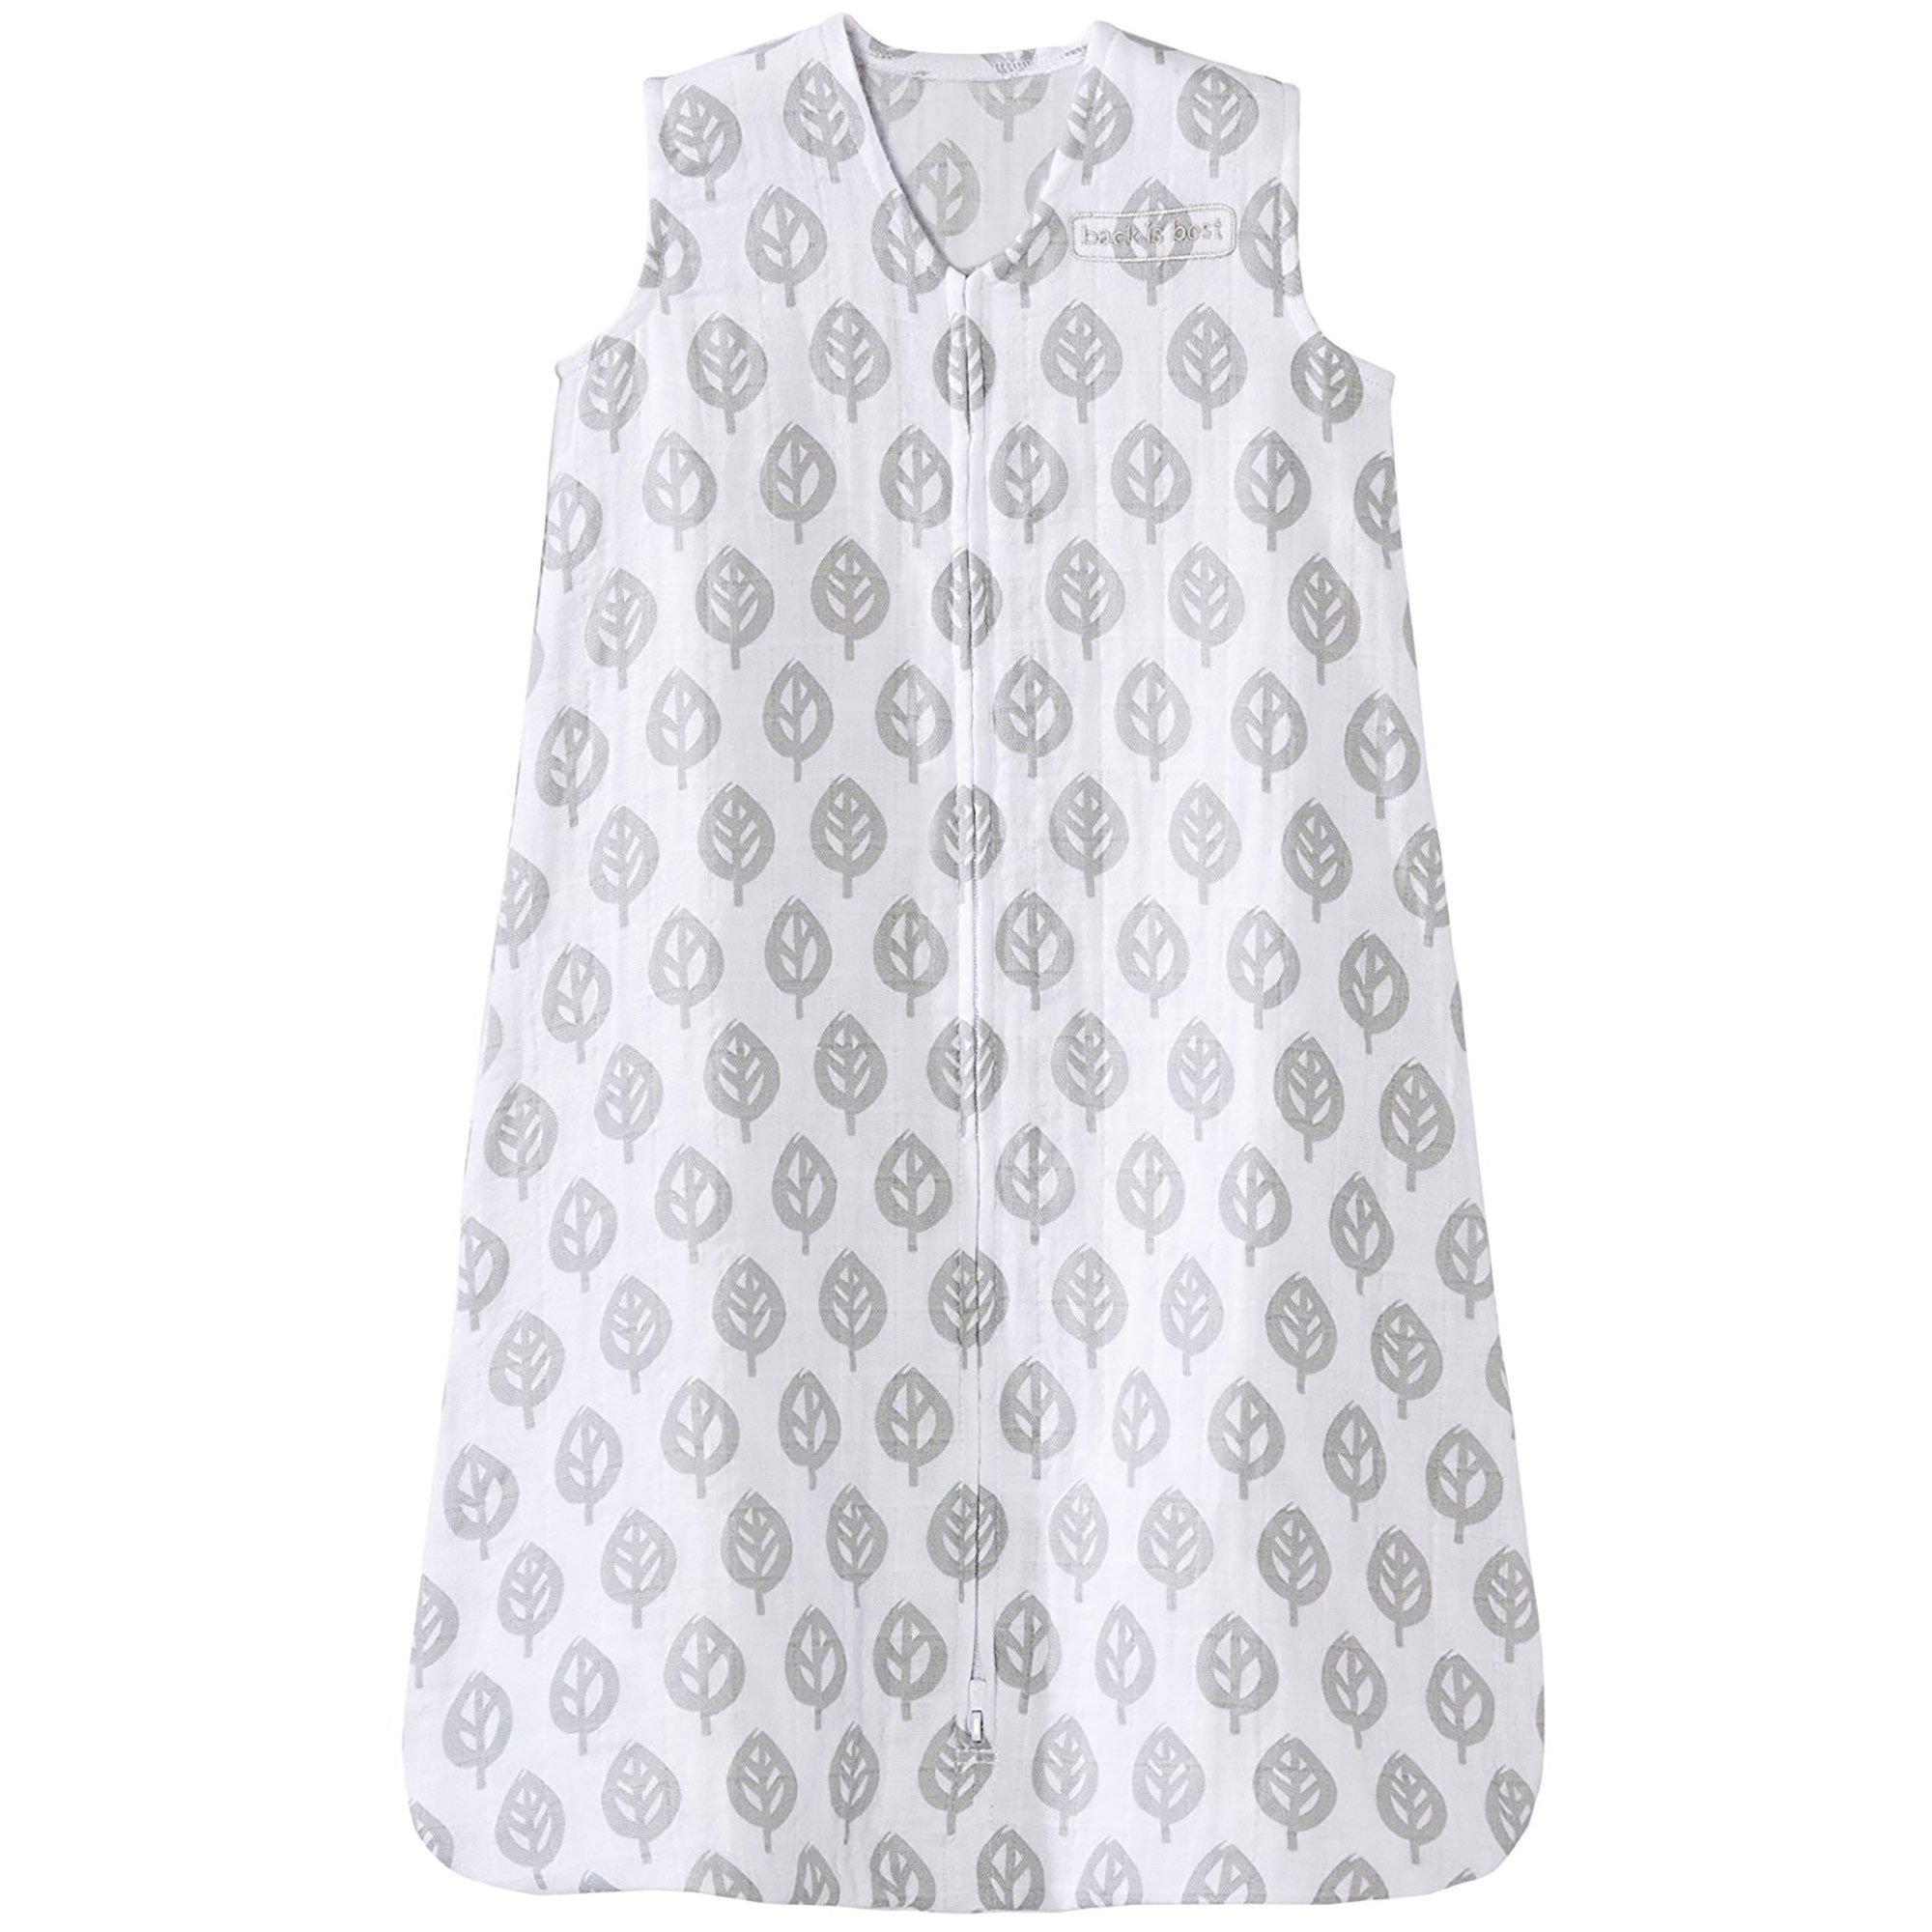 HALO 100% Cotton Muslin Sleep Sack Wearable Blanket, Gray Tree Leaf, Large